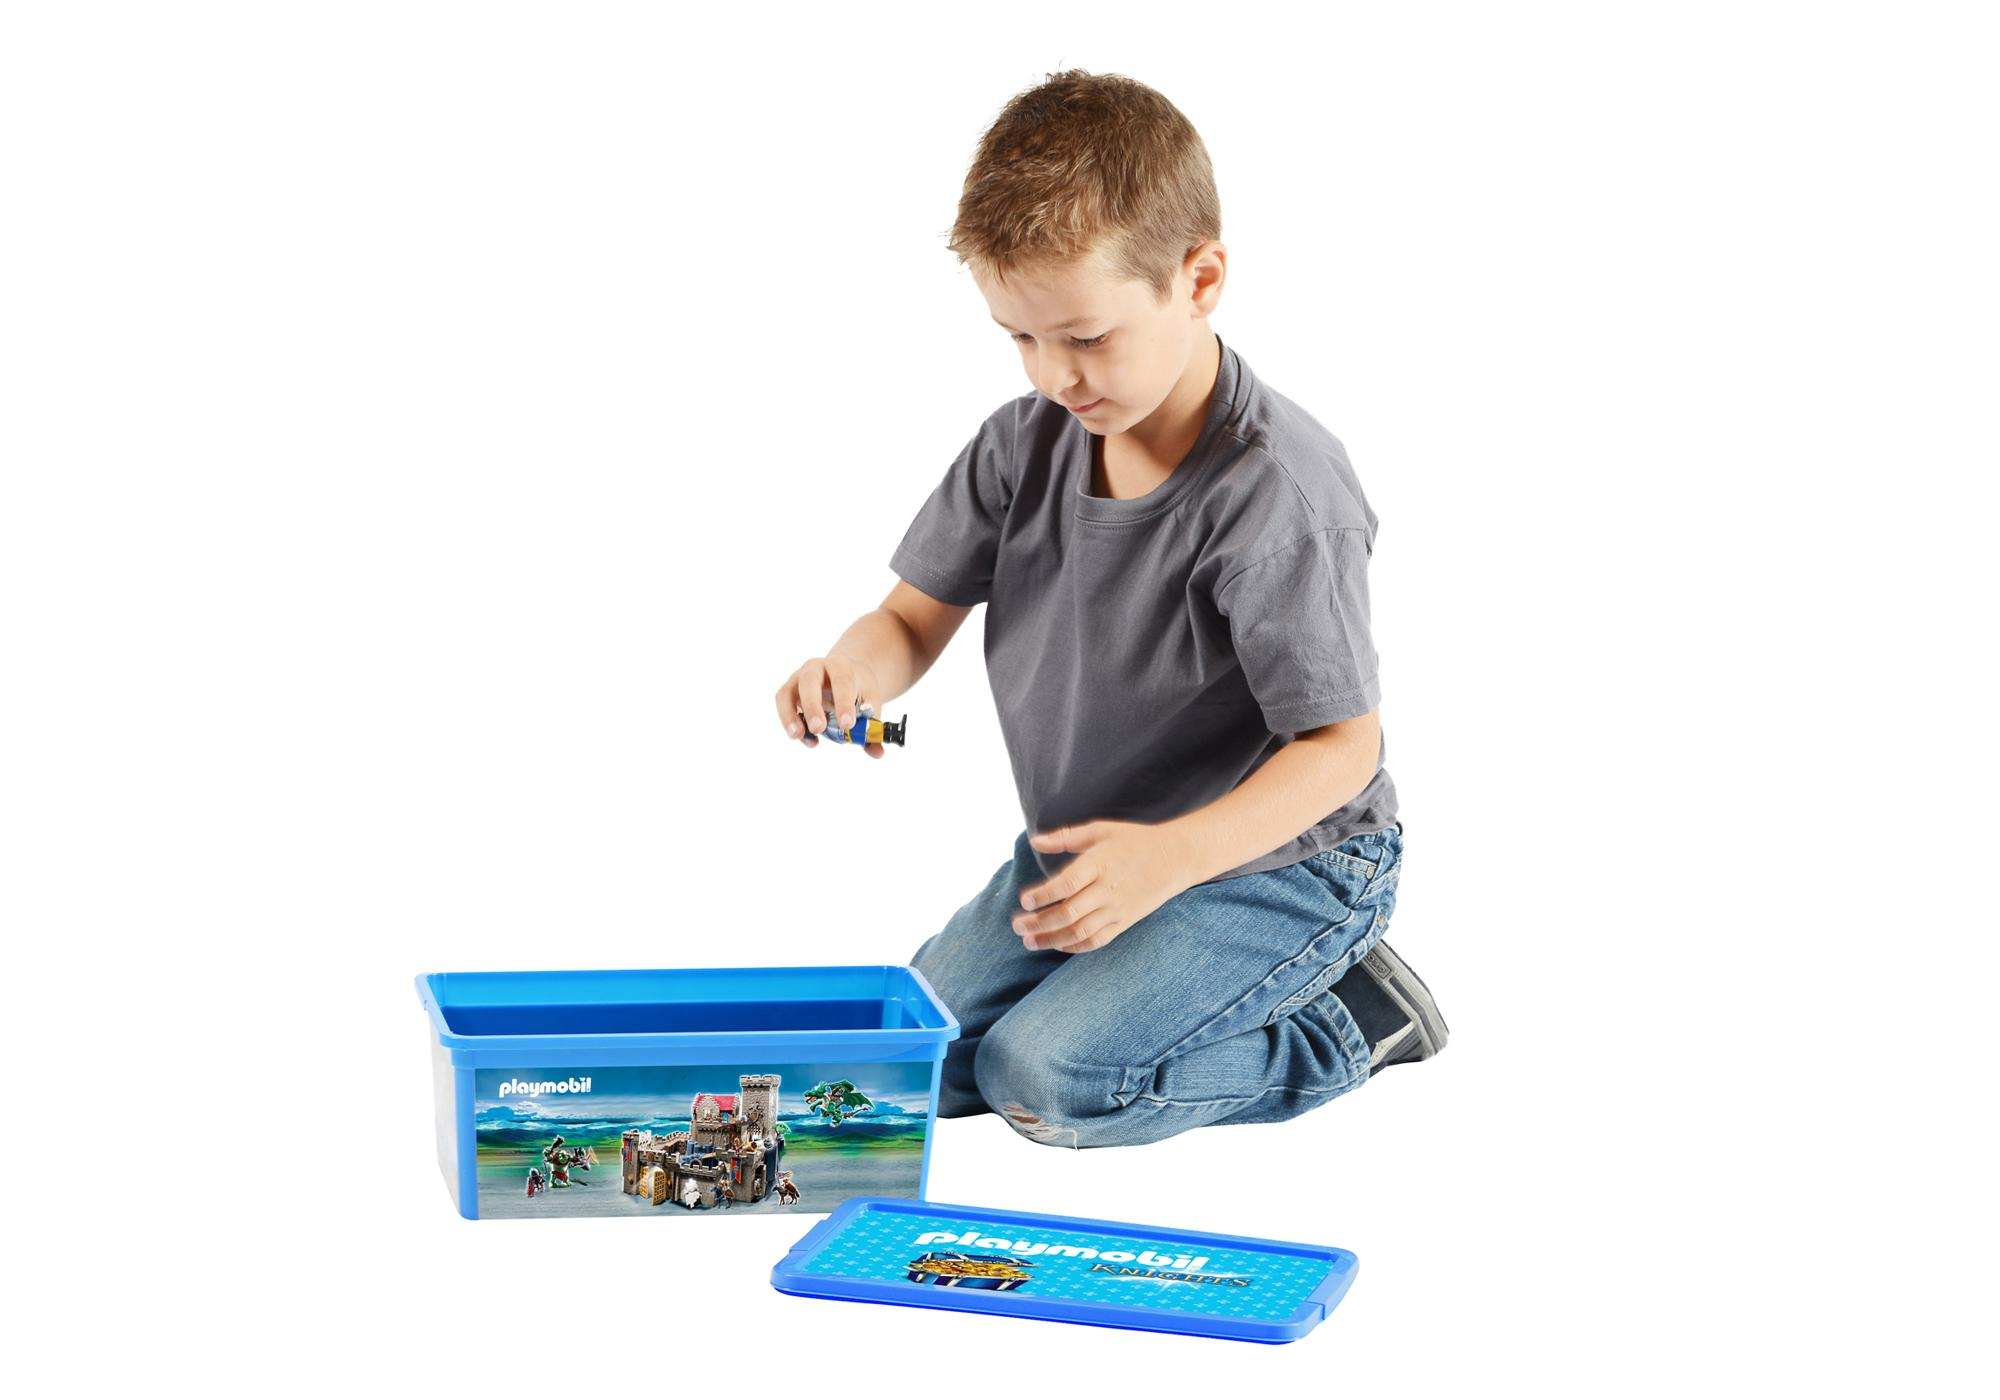 http://media.playmobil.com/i/playmobil/80489_product_extra2/6L RITTER Aufbewahrungsbox